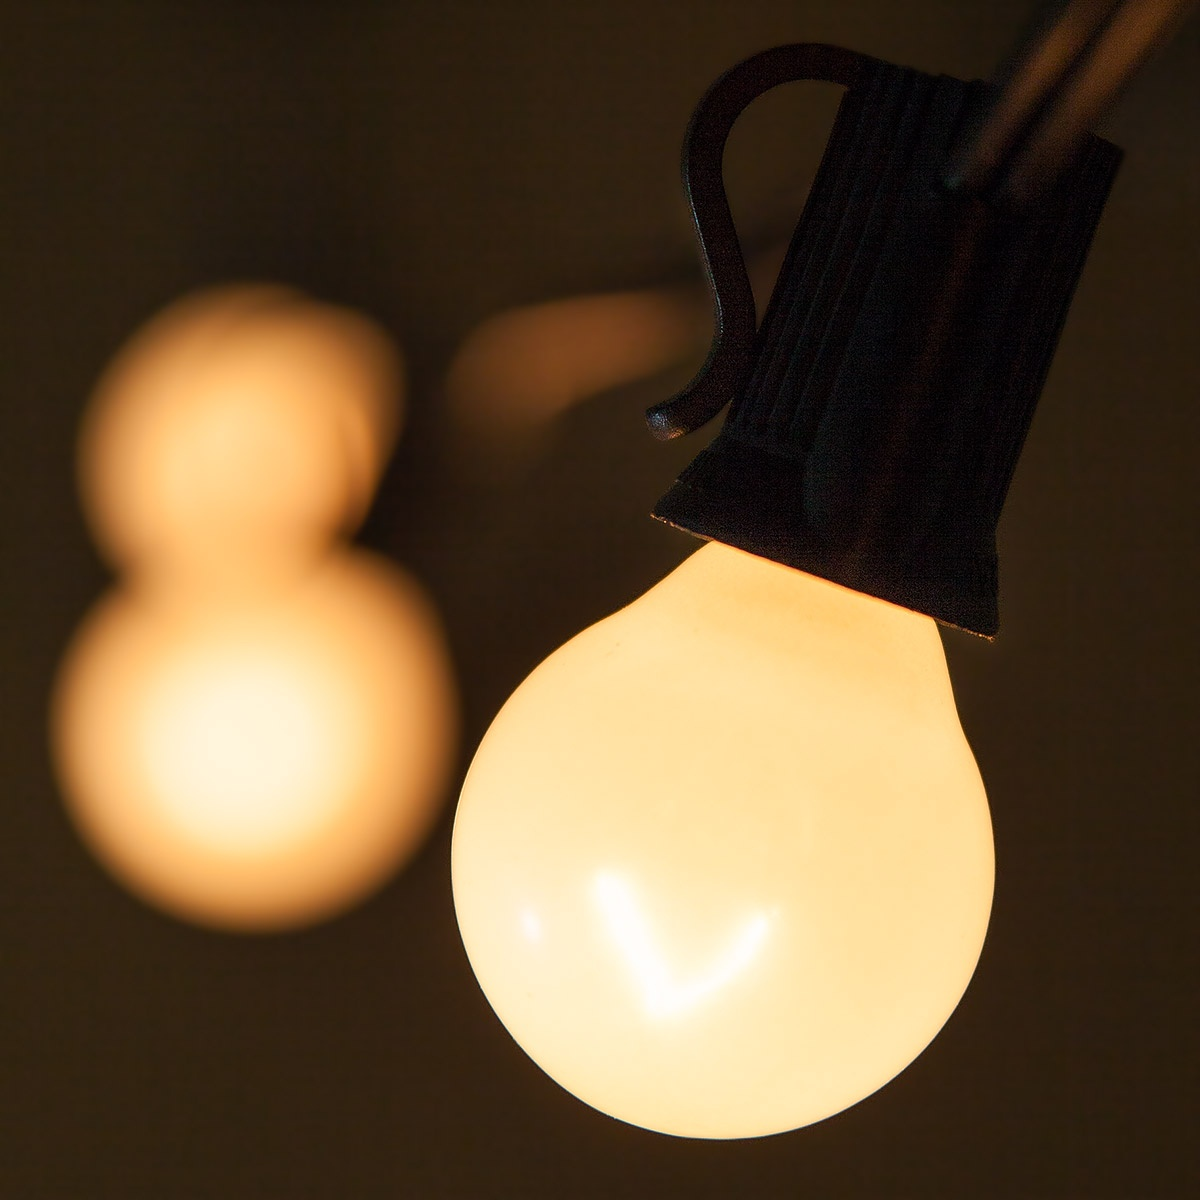 C9 Led Christmas Light Bulbs